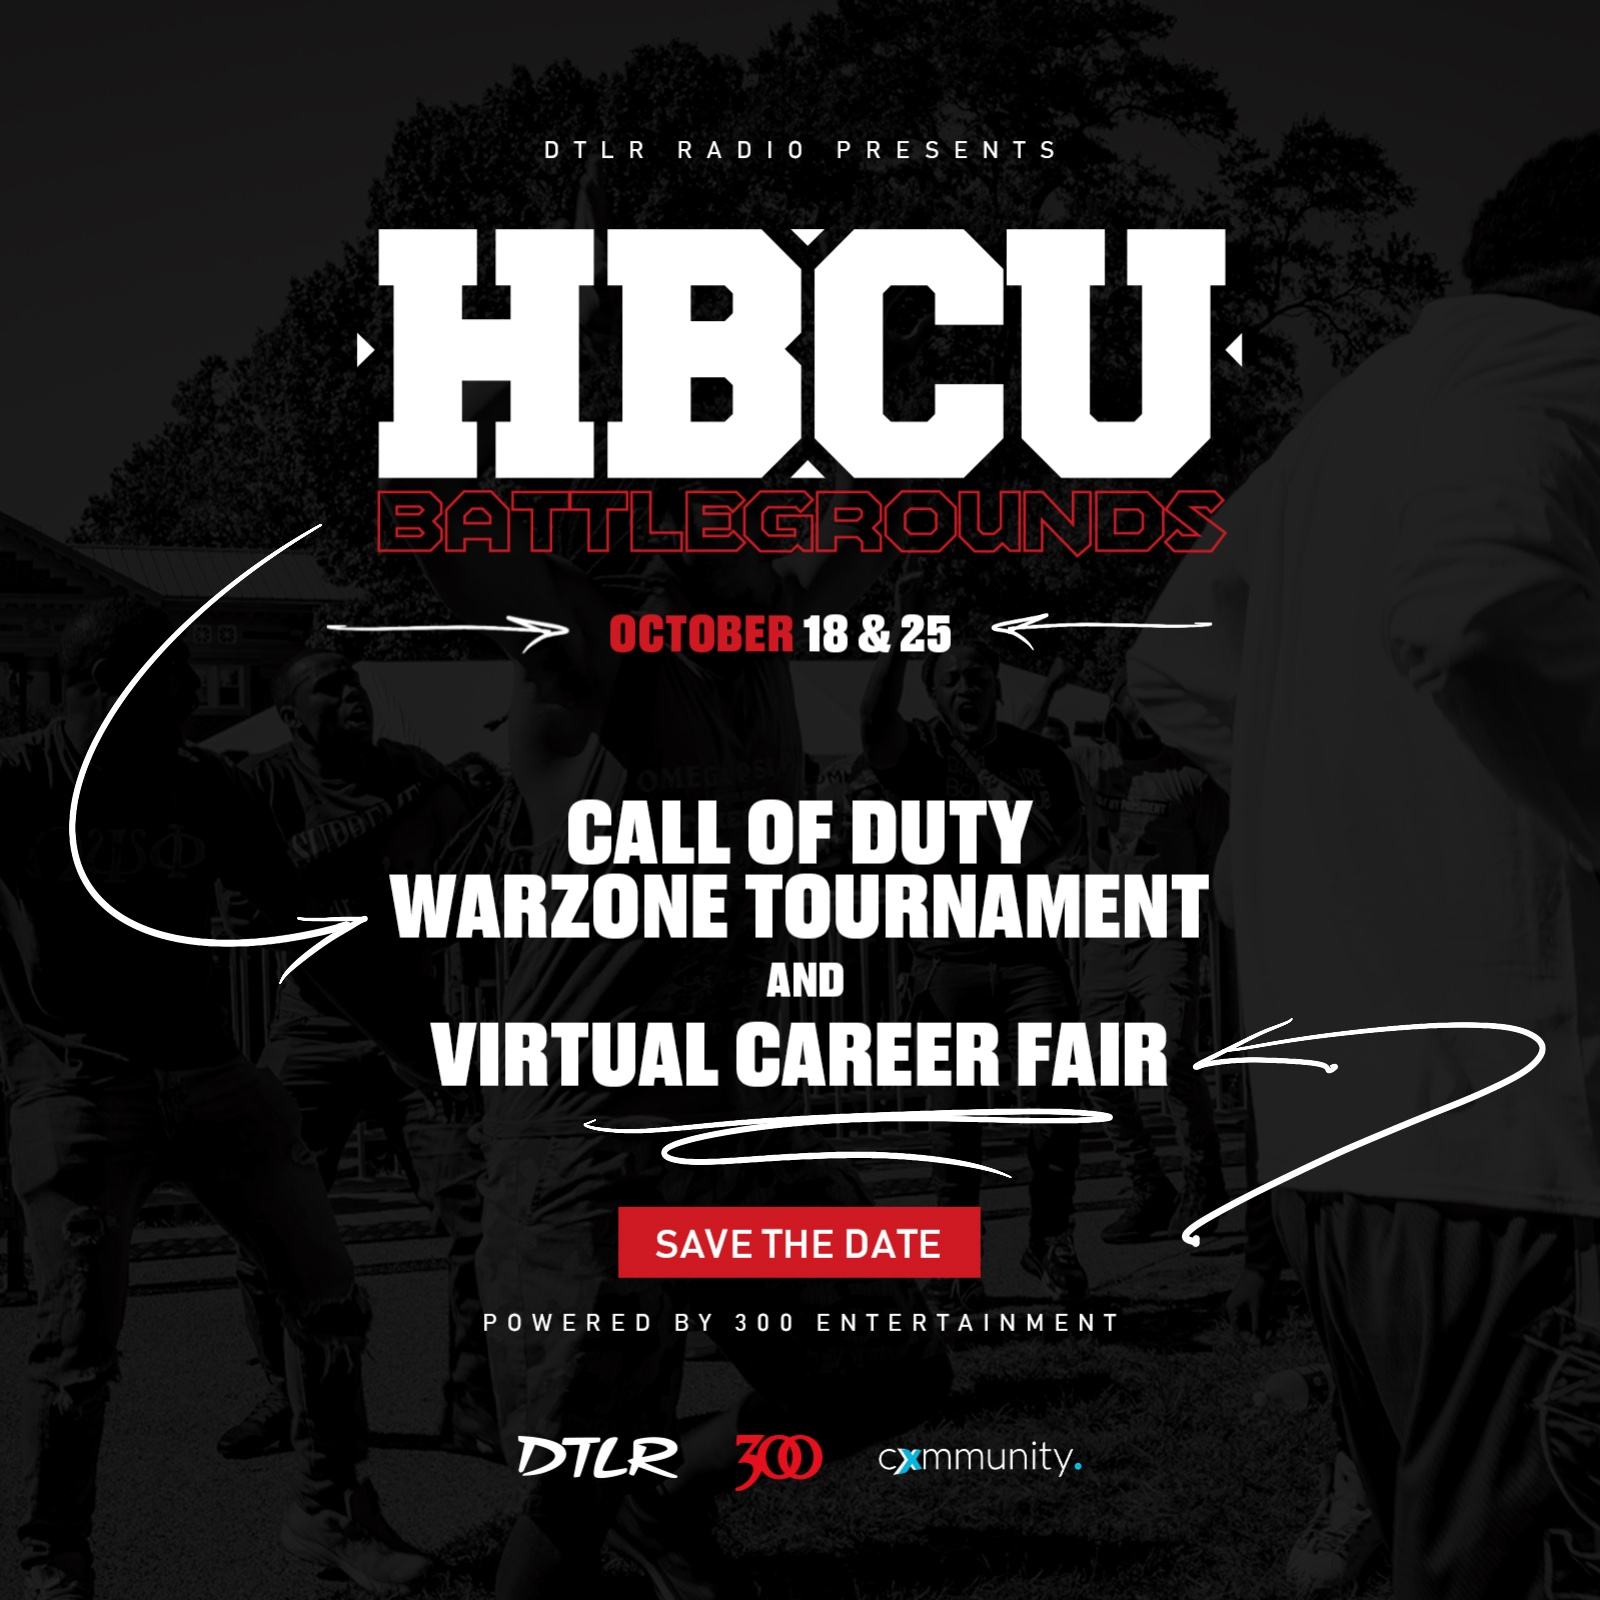 DTLR HBCU esports career fair